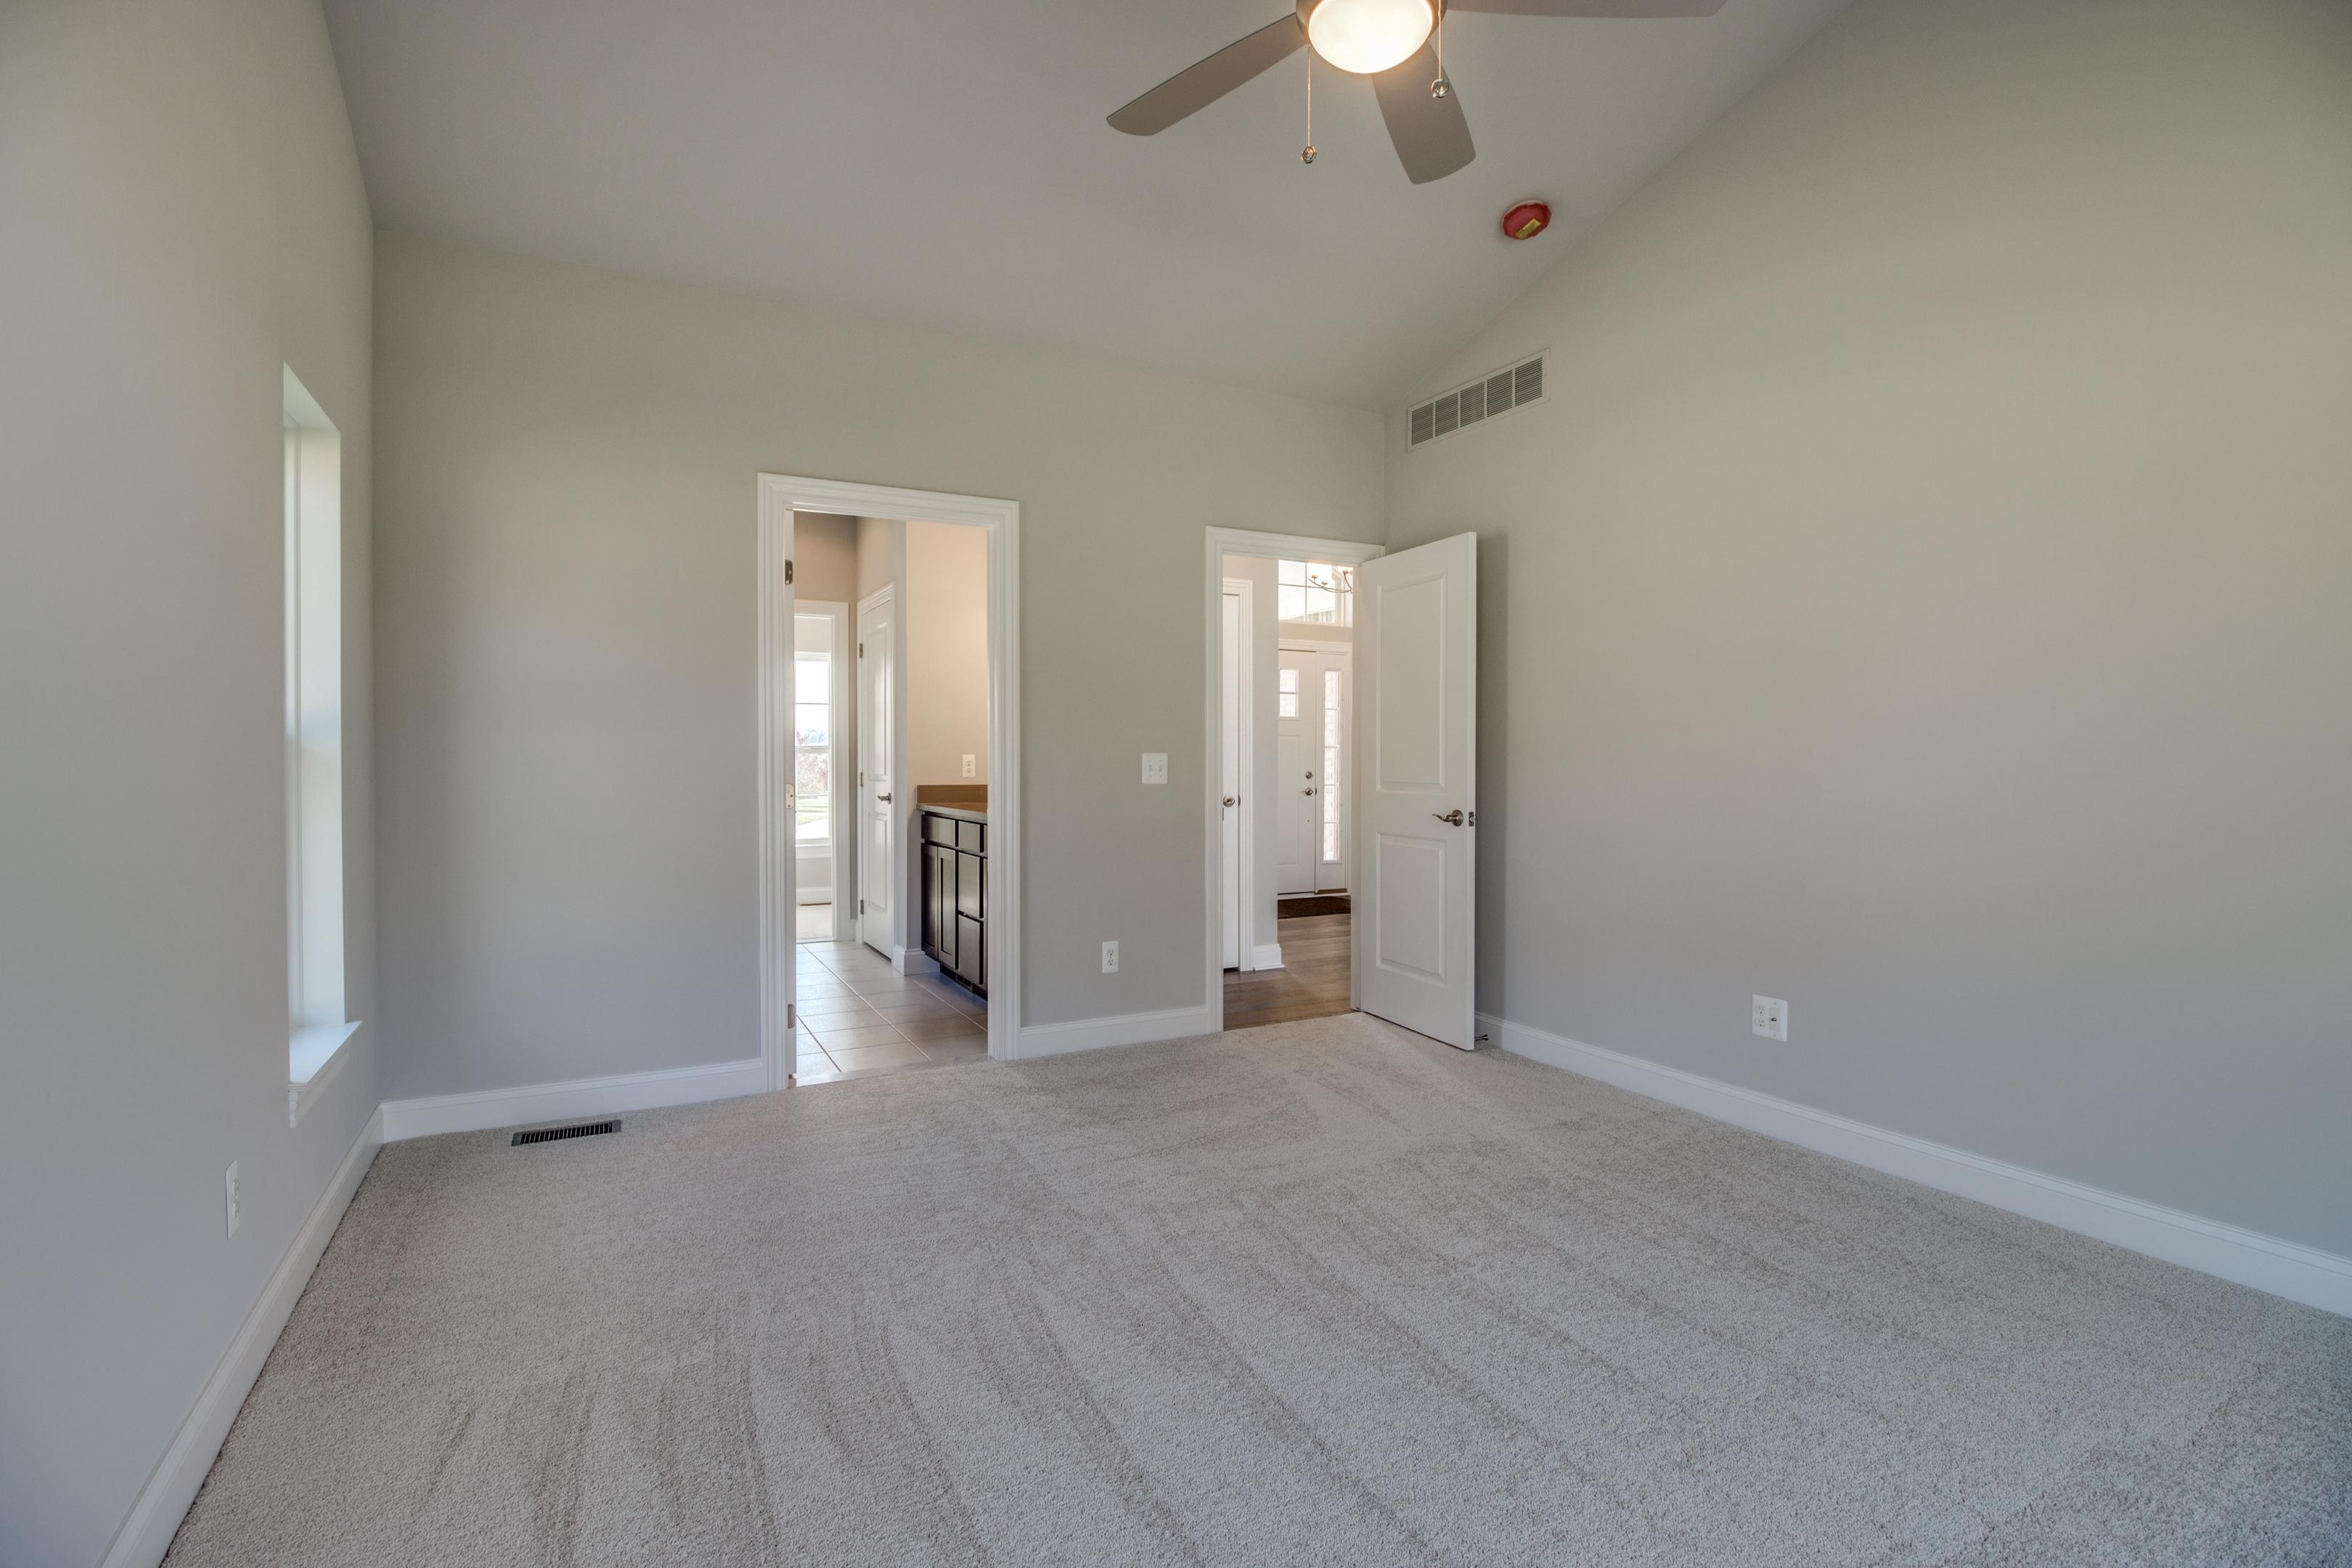 Interiors 6.jpg